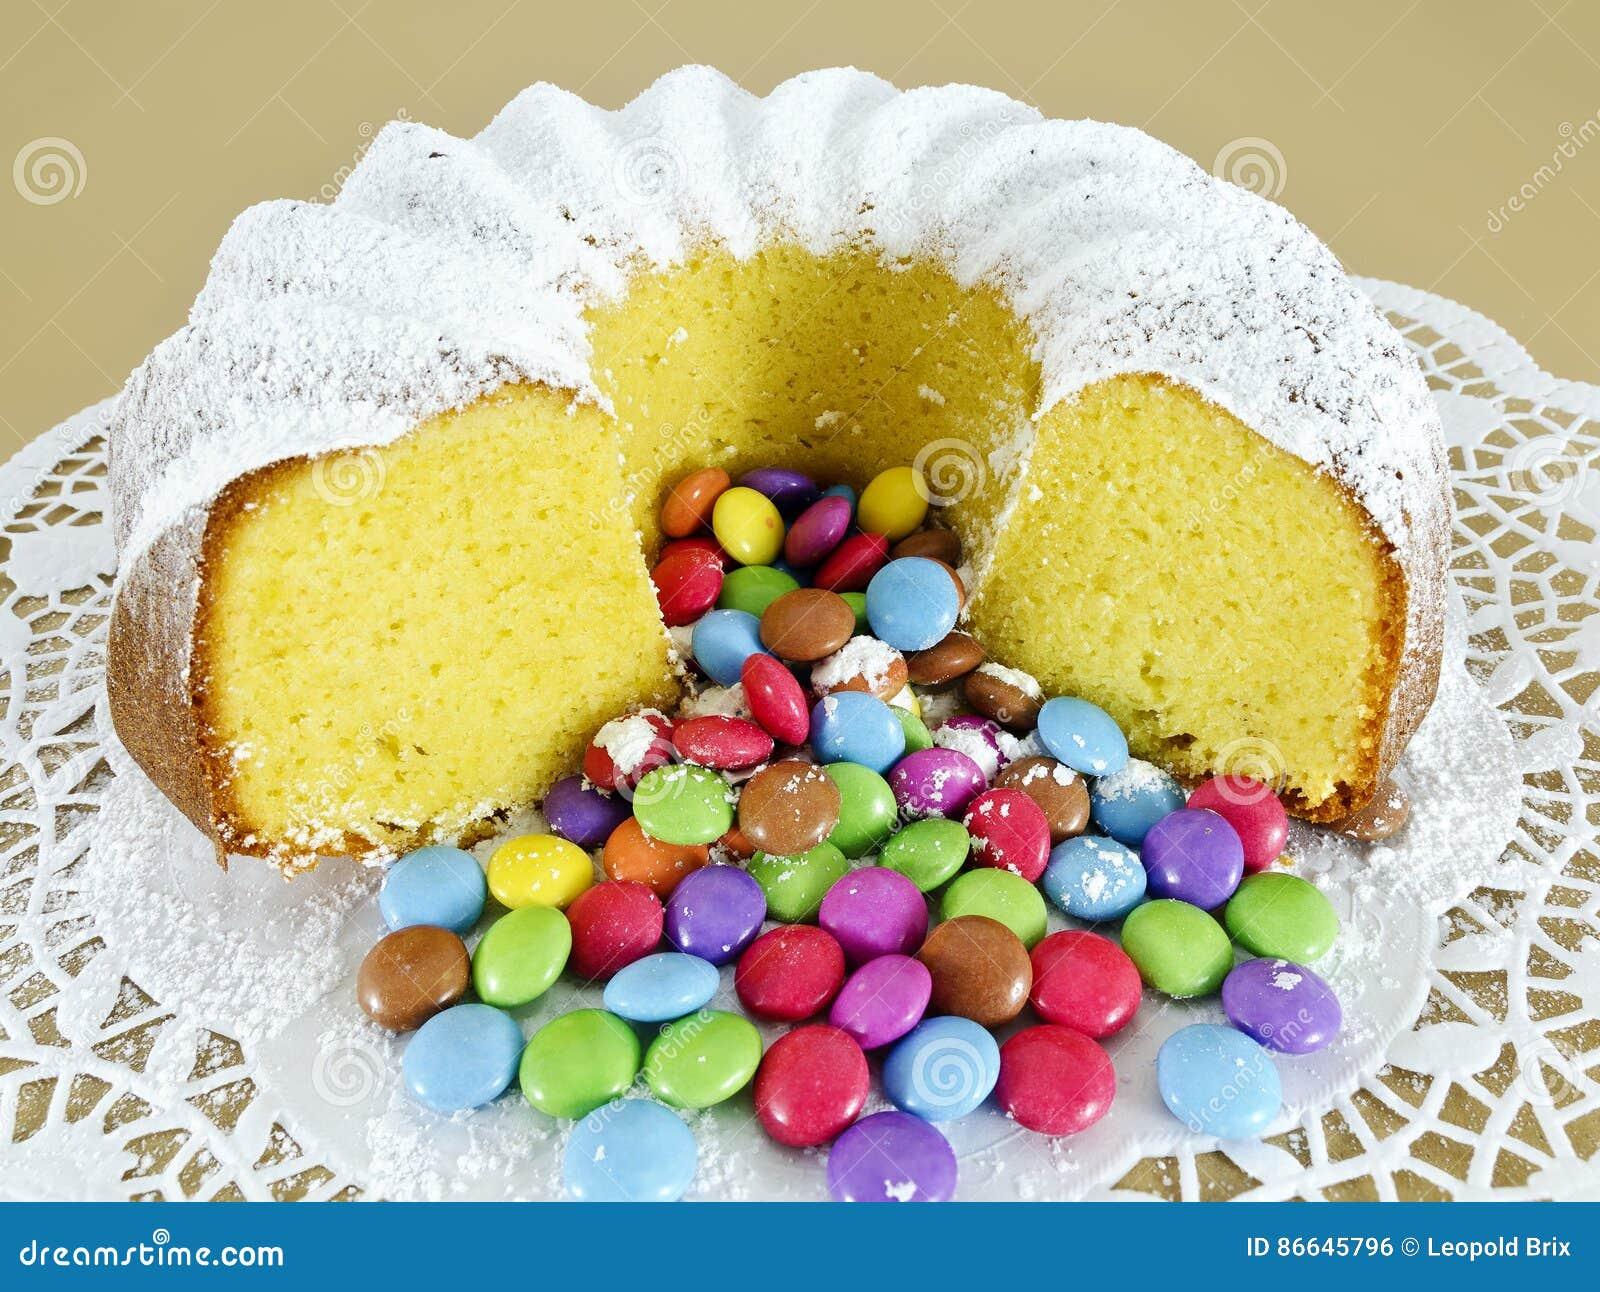 Chocolate Powdered Sugar Pound Cake